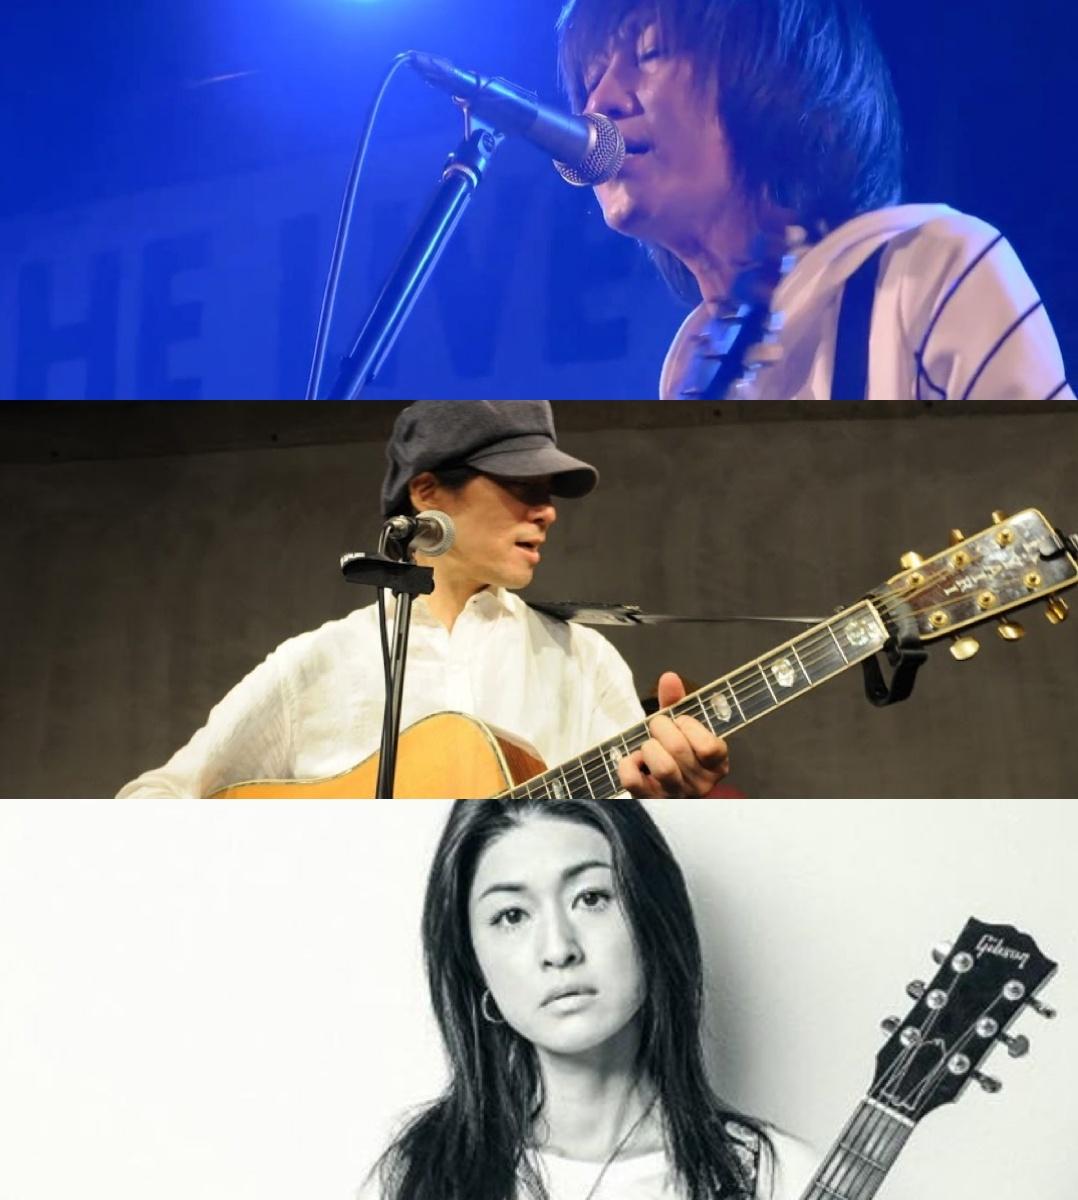 『Singin' Gypsies』出演:Sengen. / 長谷志恩 / 西尾祐理子